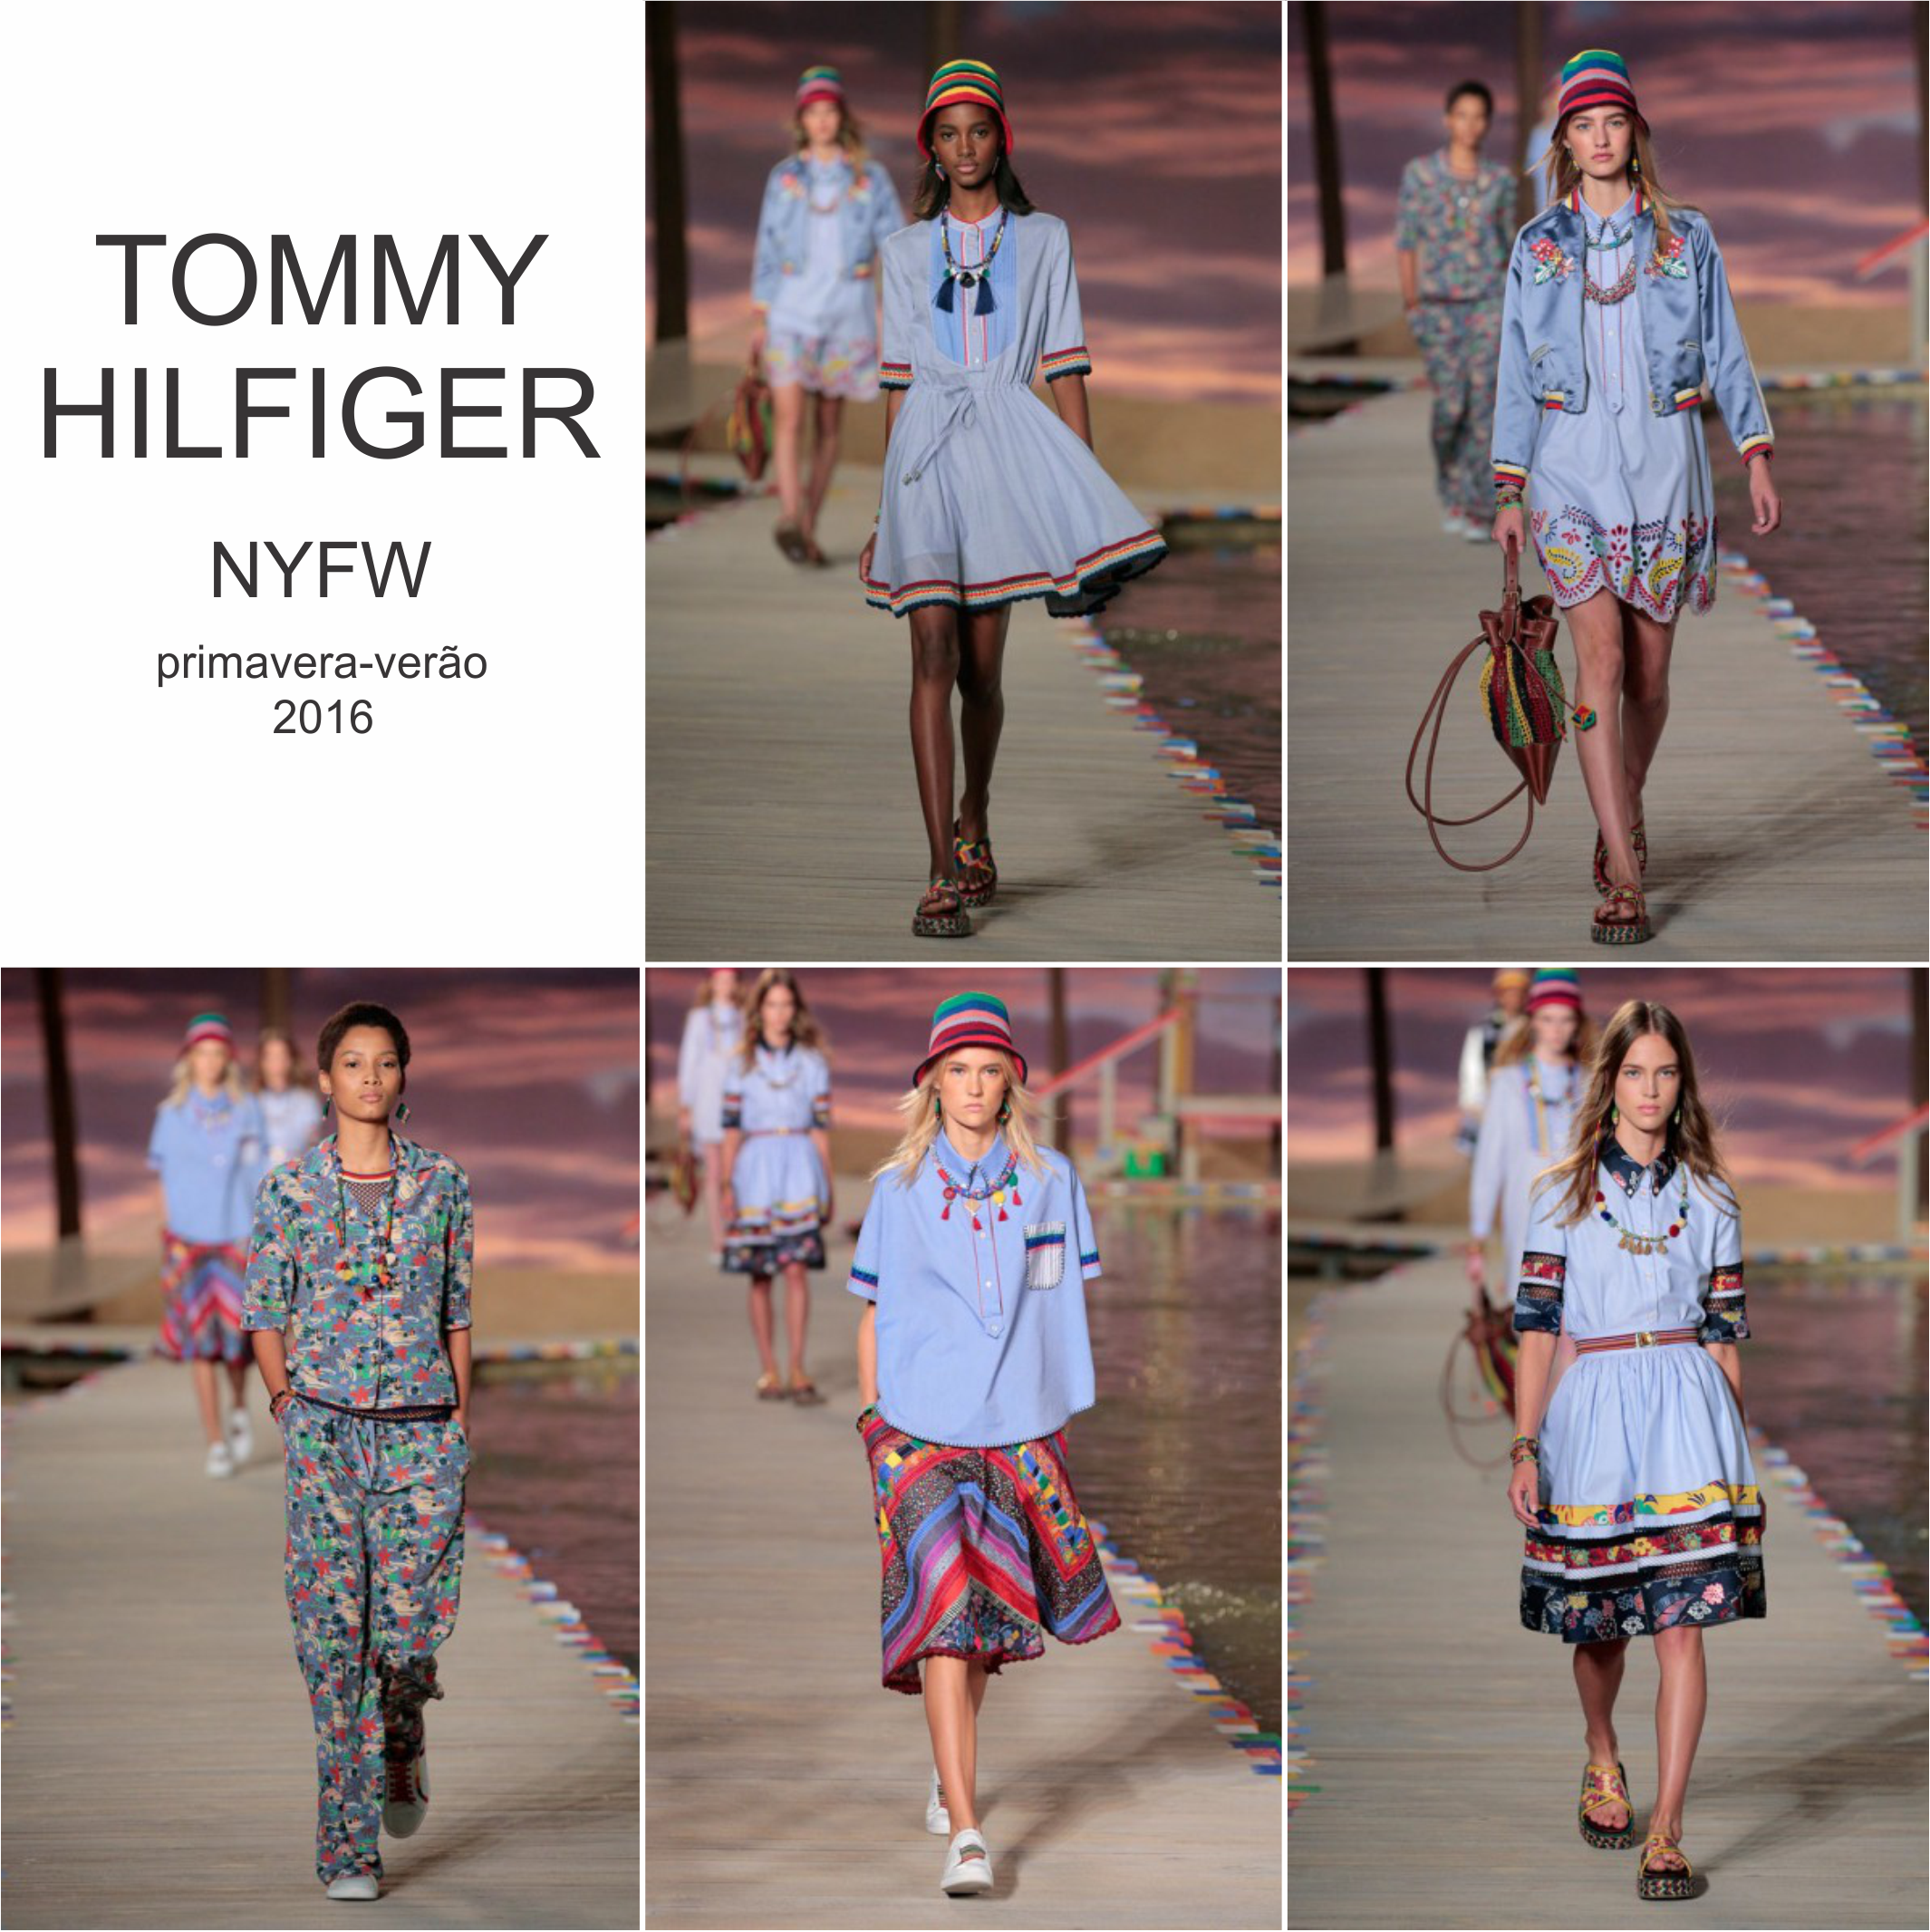 tommy-hilfiger-primavera-verao-nyfw-2016-1